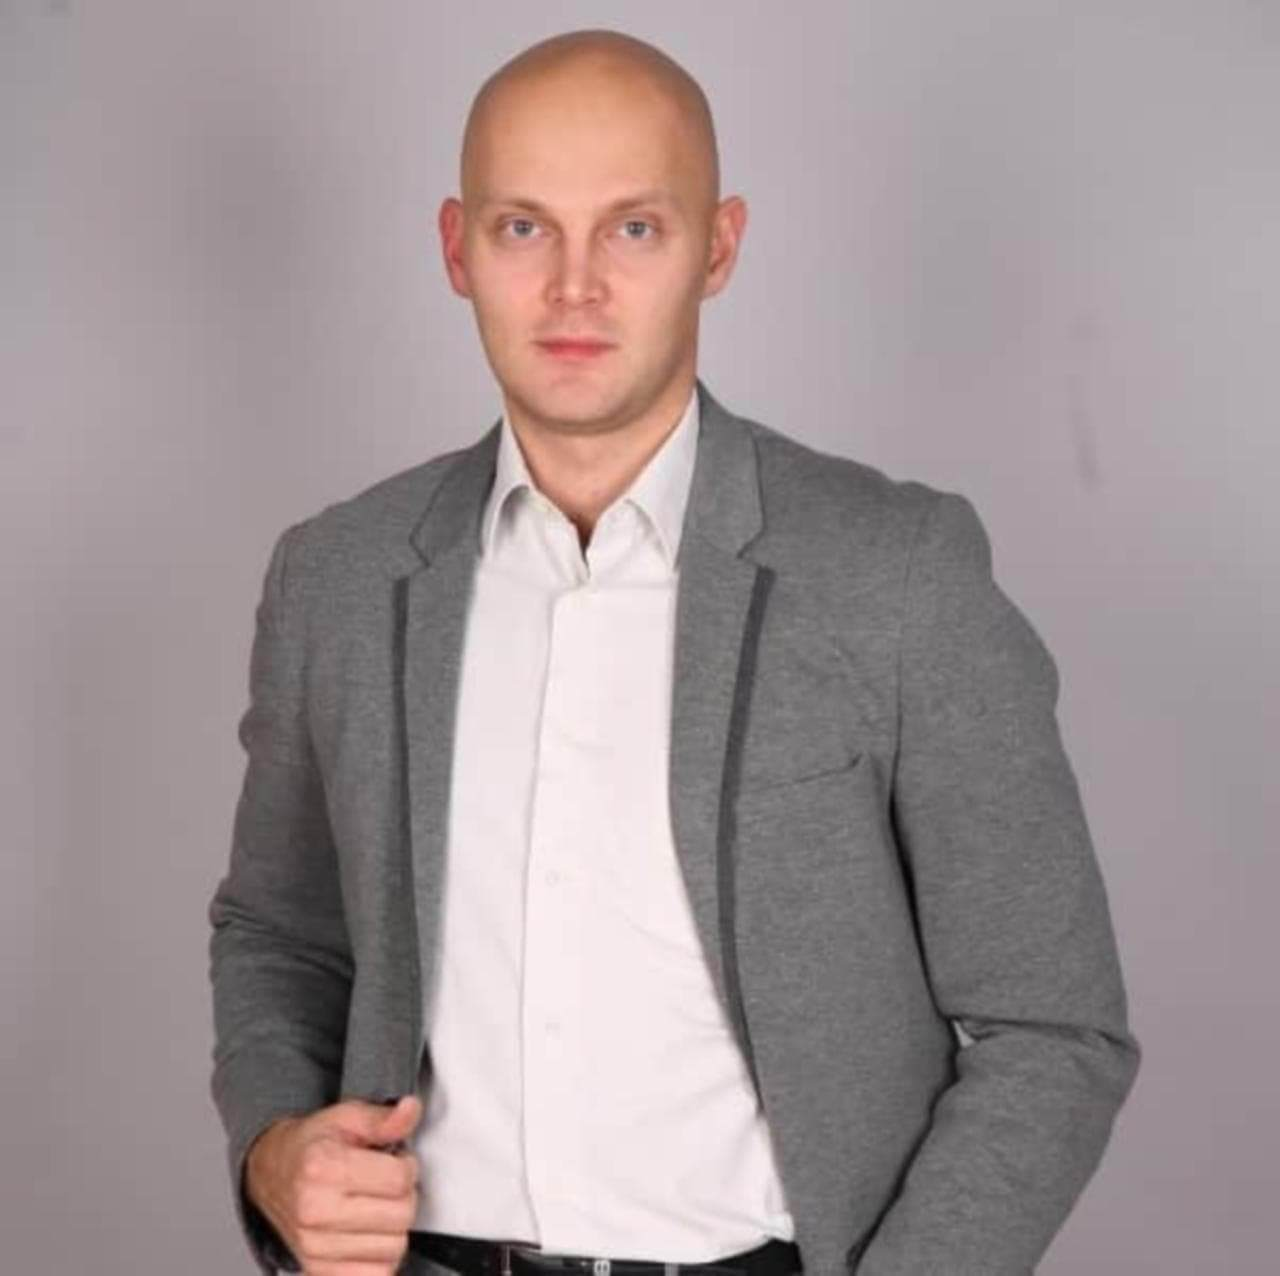 Астафьев Дмитрий Олегович психолог бизнес тренер